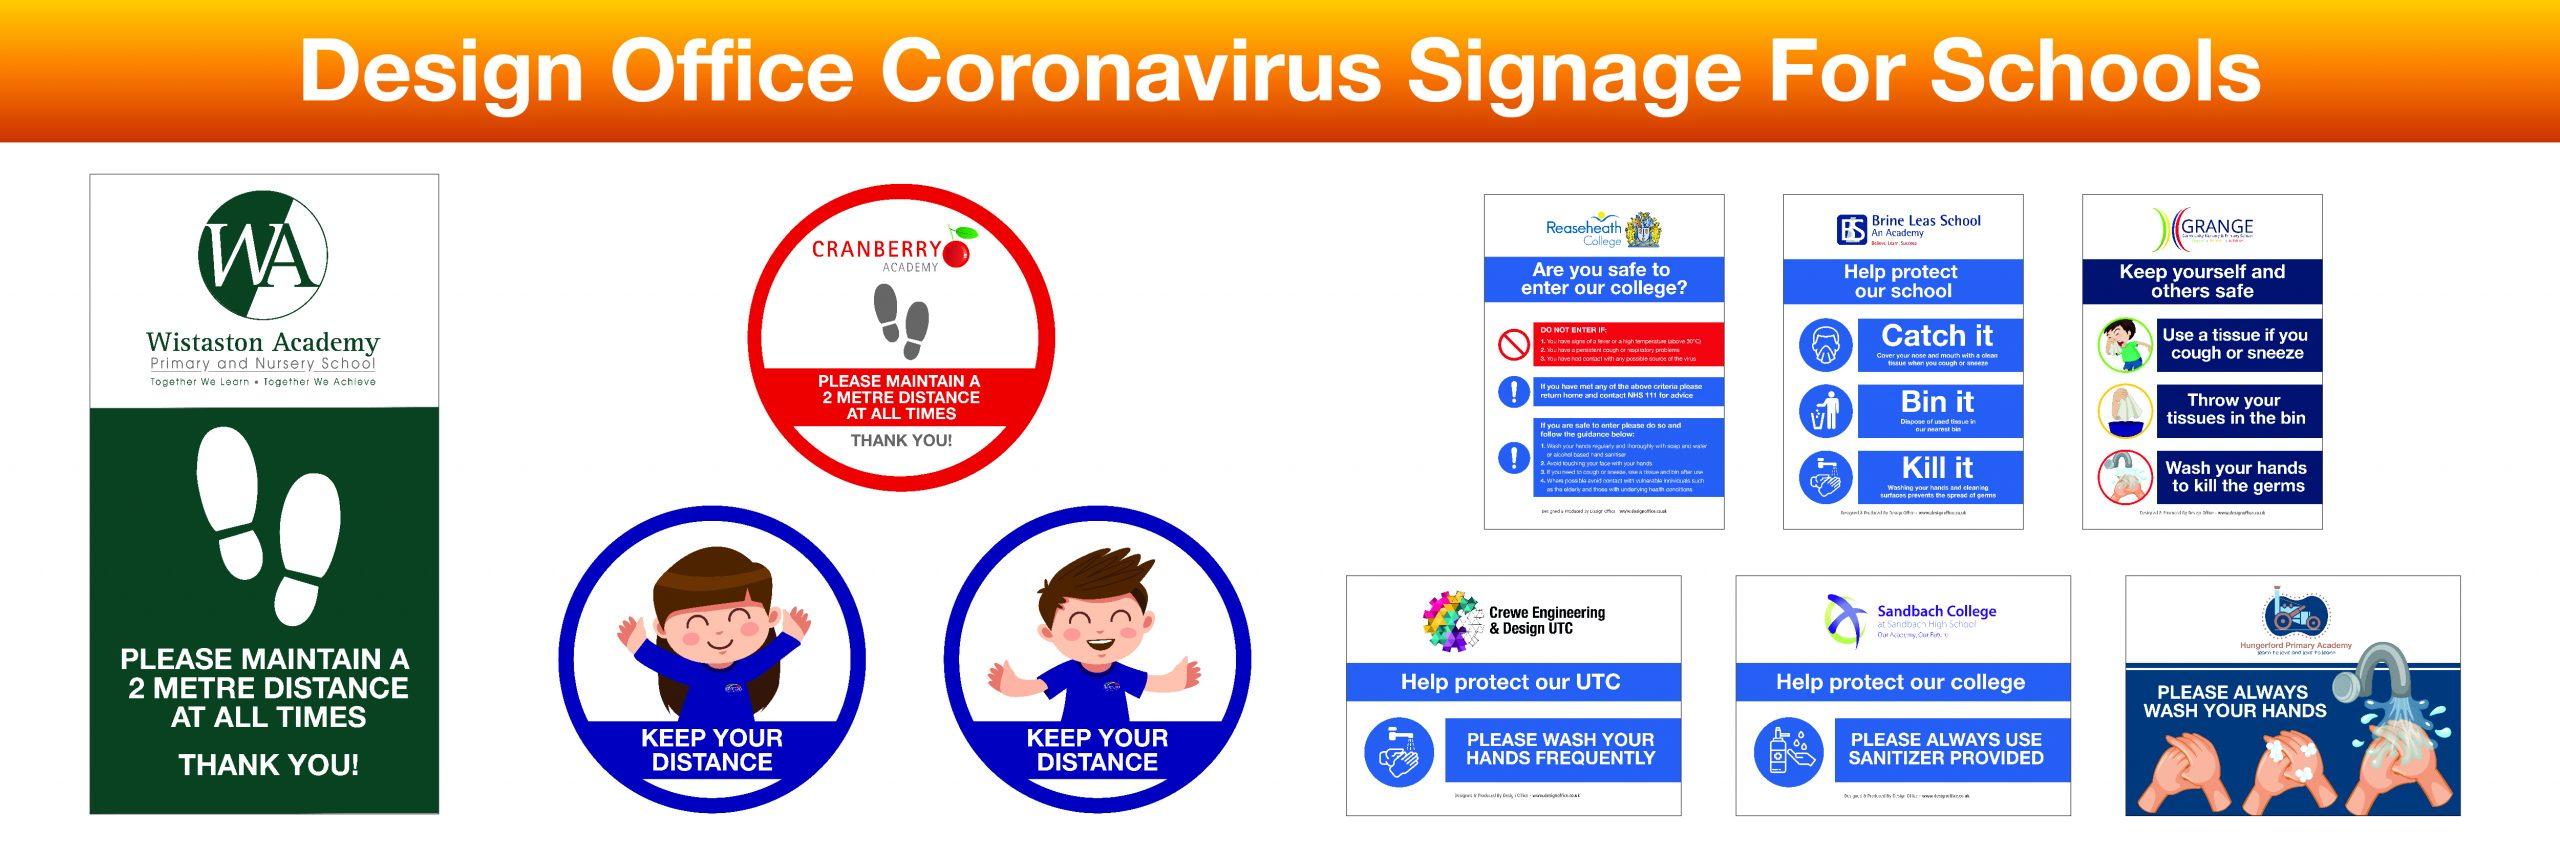 Coronavirus Signage For Schools